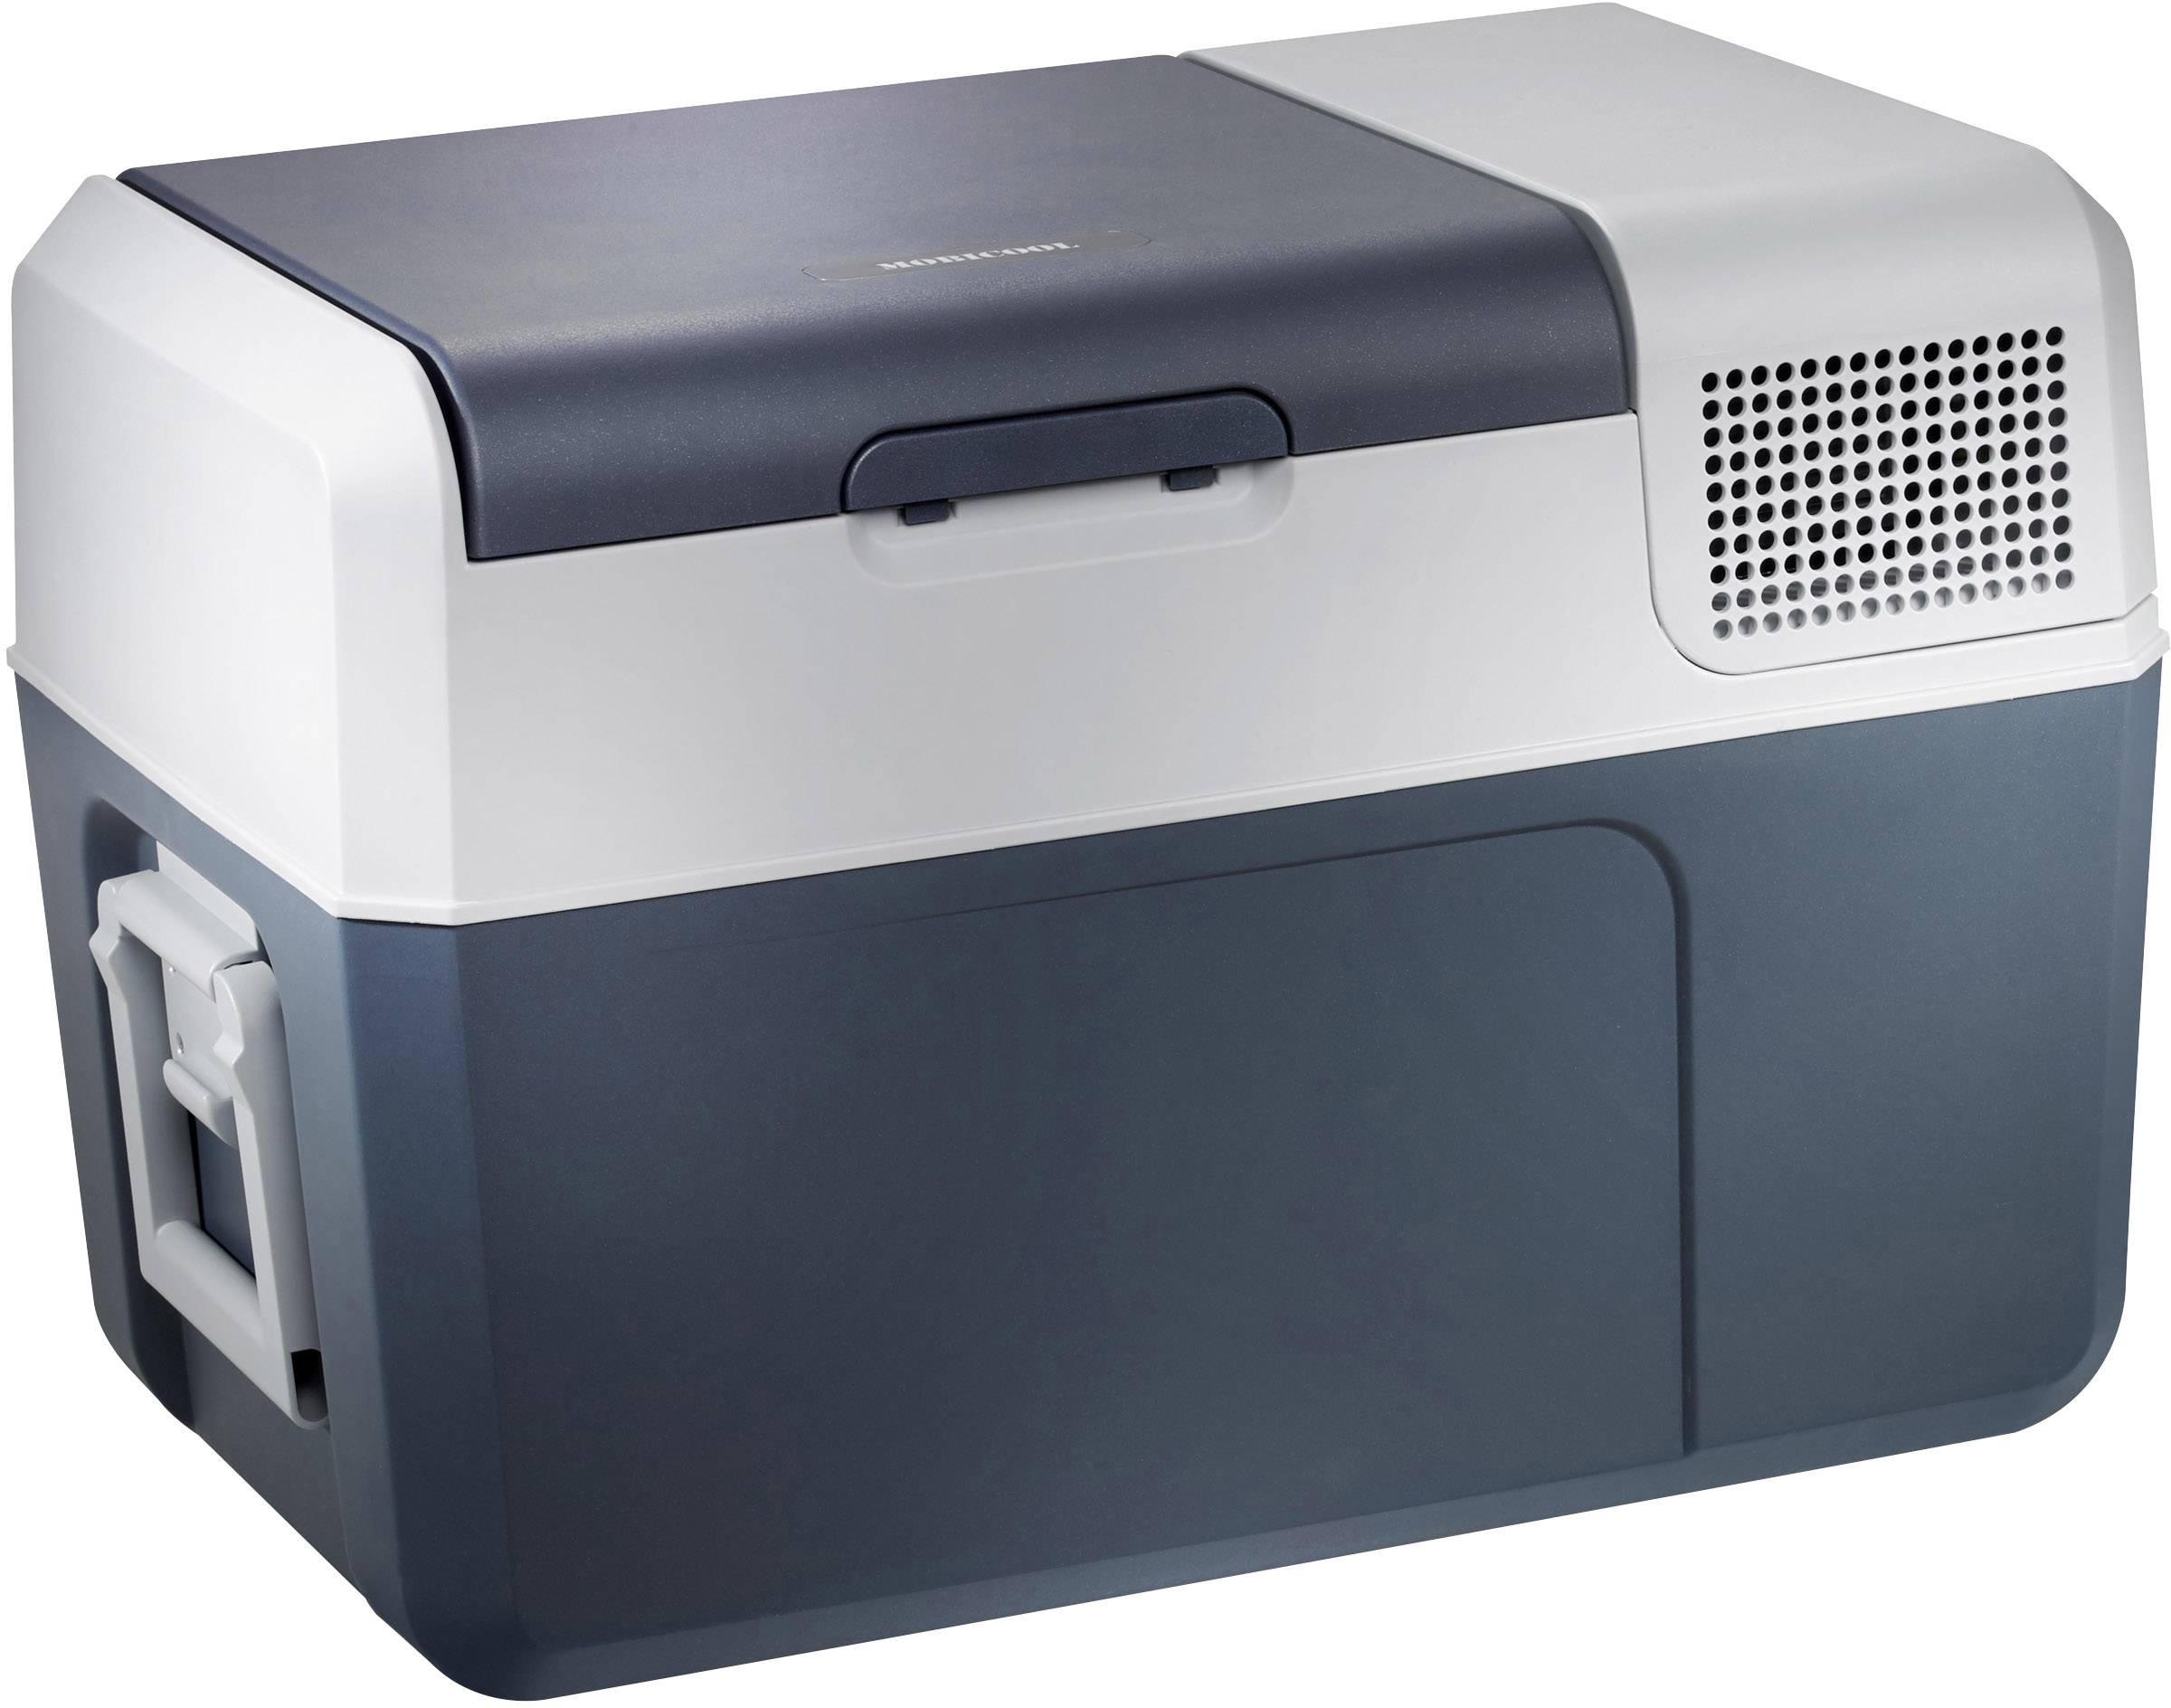 Kühlschrank Für Auto Mit Kompressor : Mobicool fr ac dc kühlbox eek a a d kompressor v